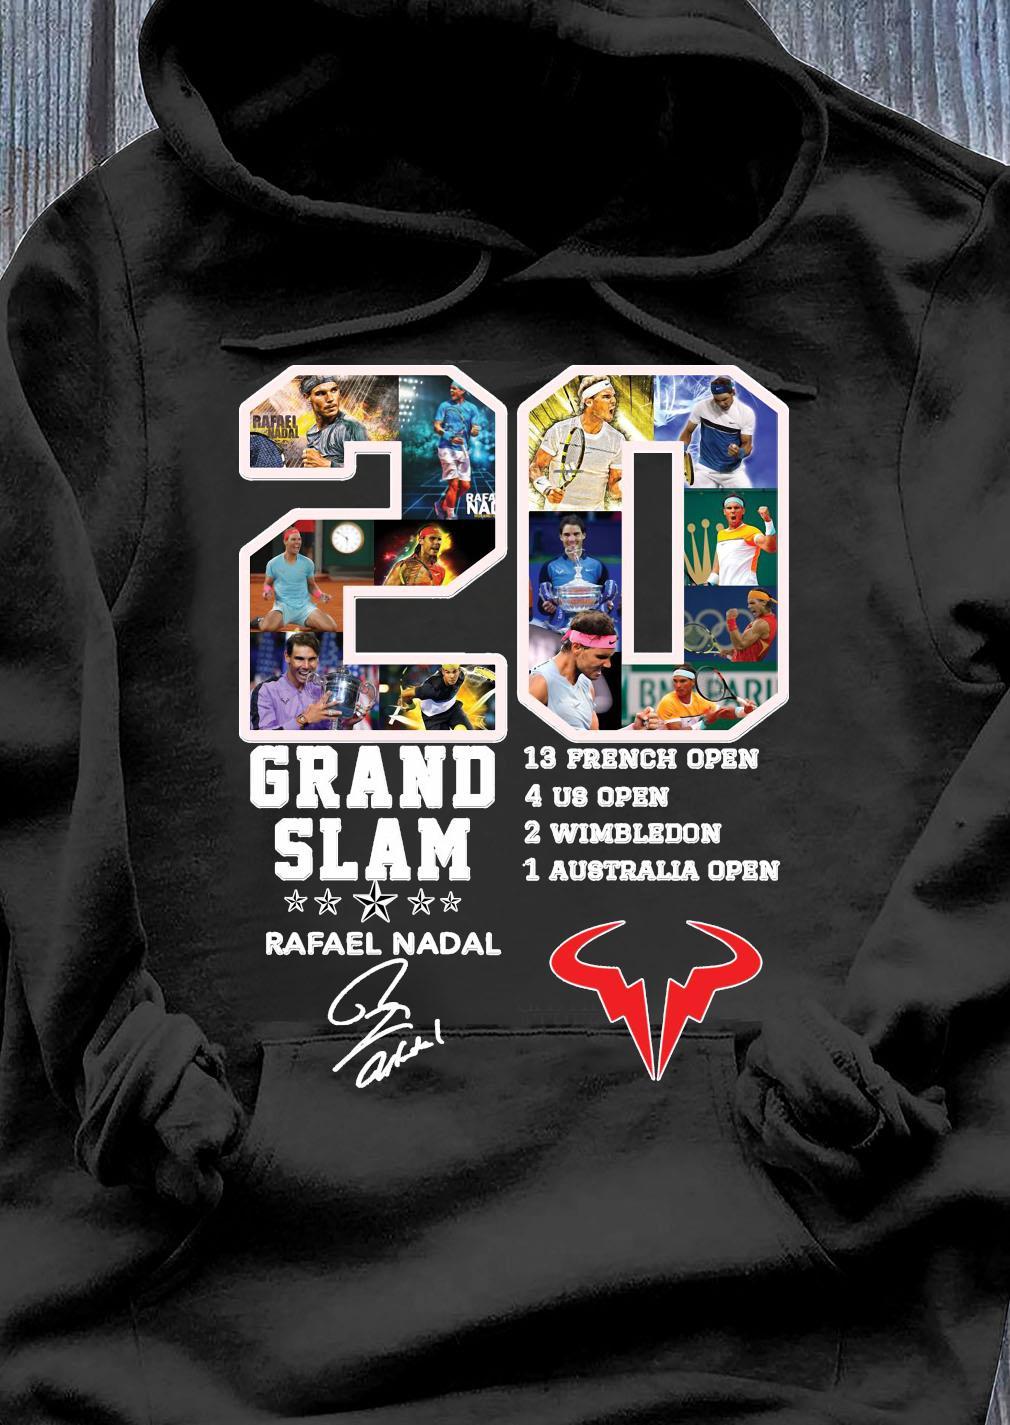 Champion 20 Grand Slam Rafael Nadal Signature T-Shirt Hoodie